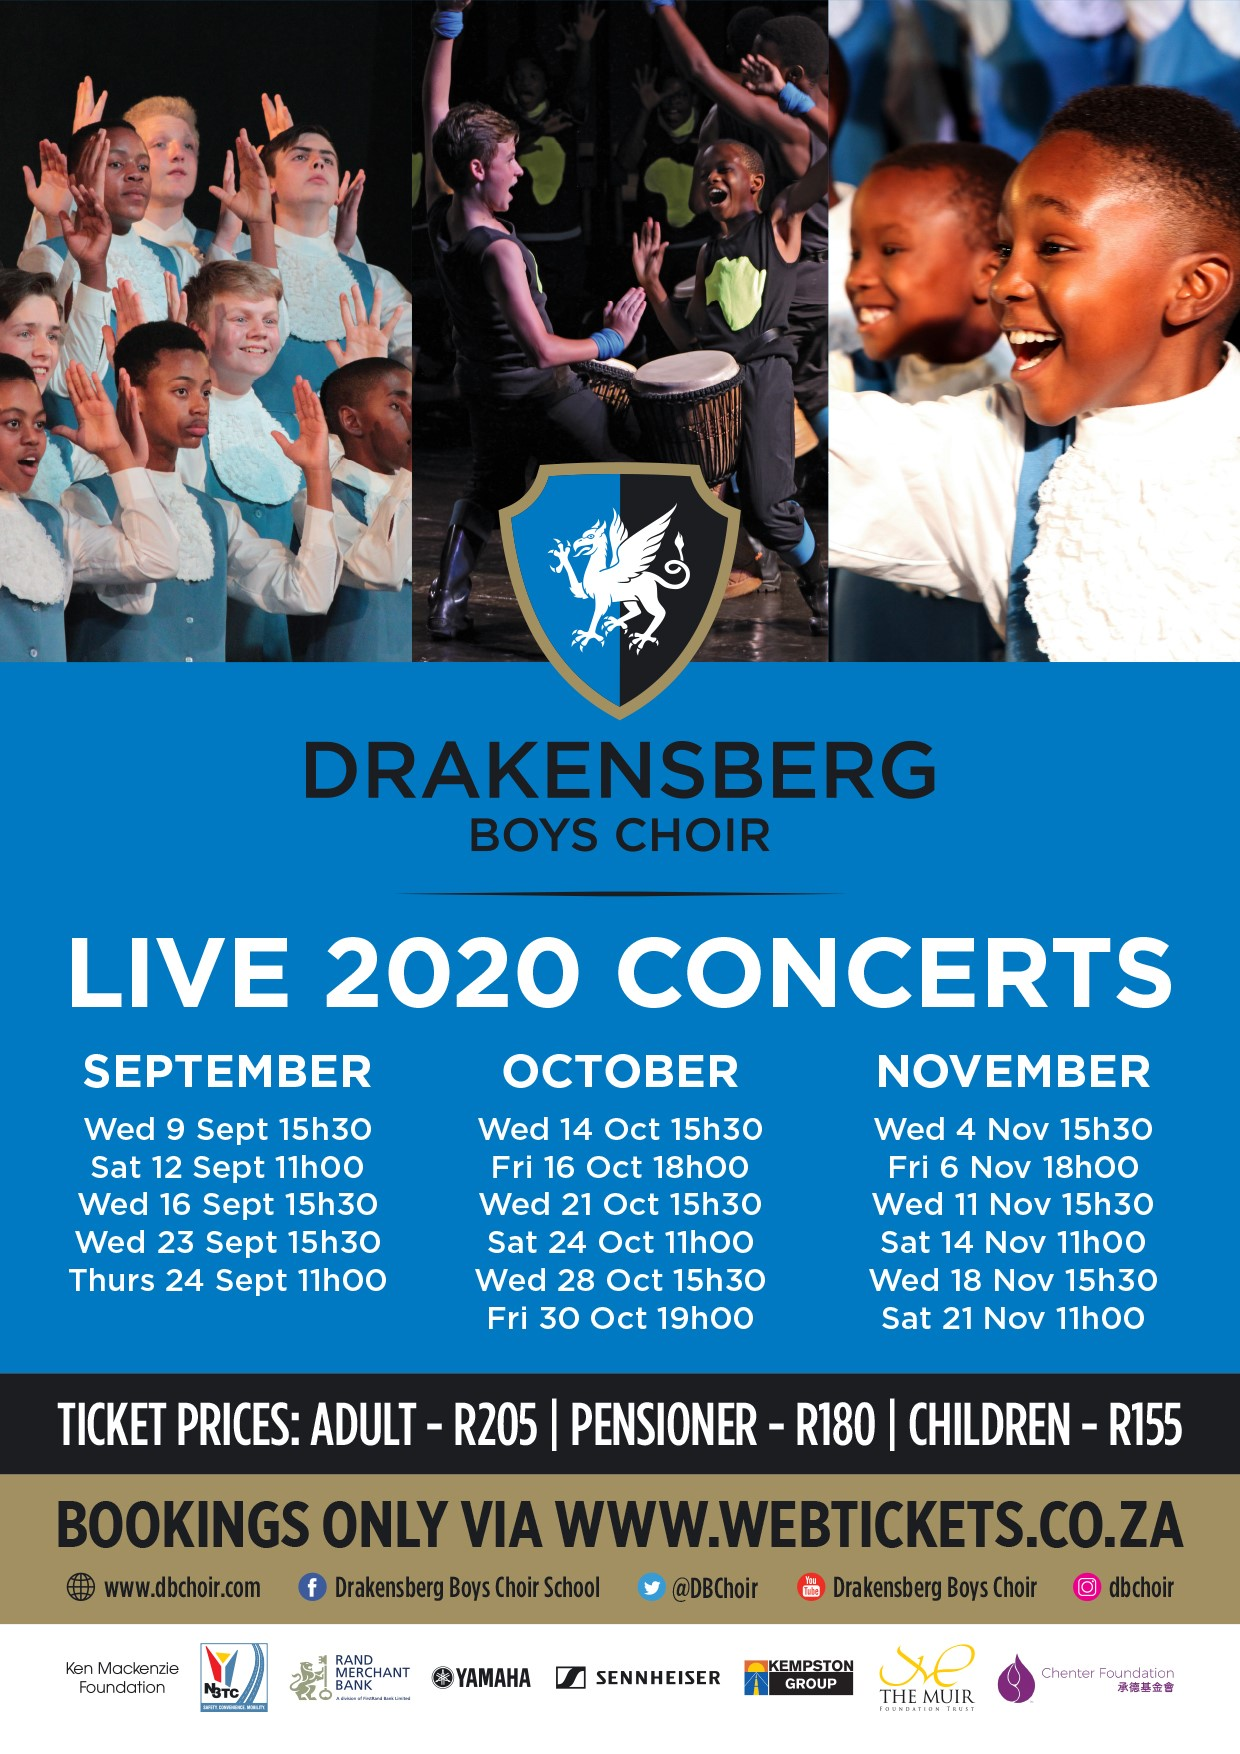 drakensberg boys choir concert schedule 2020